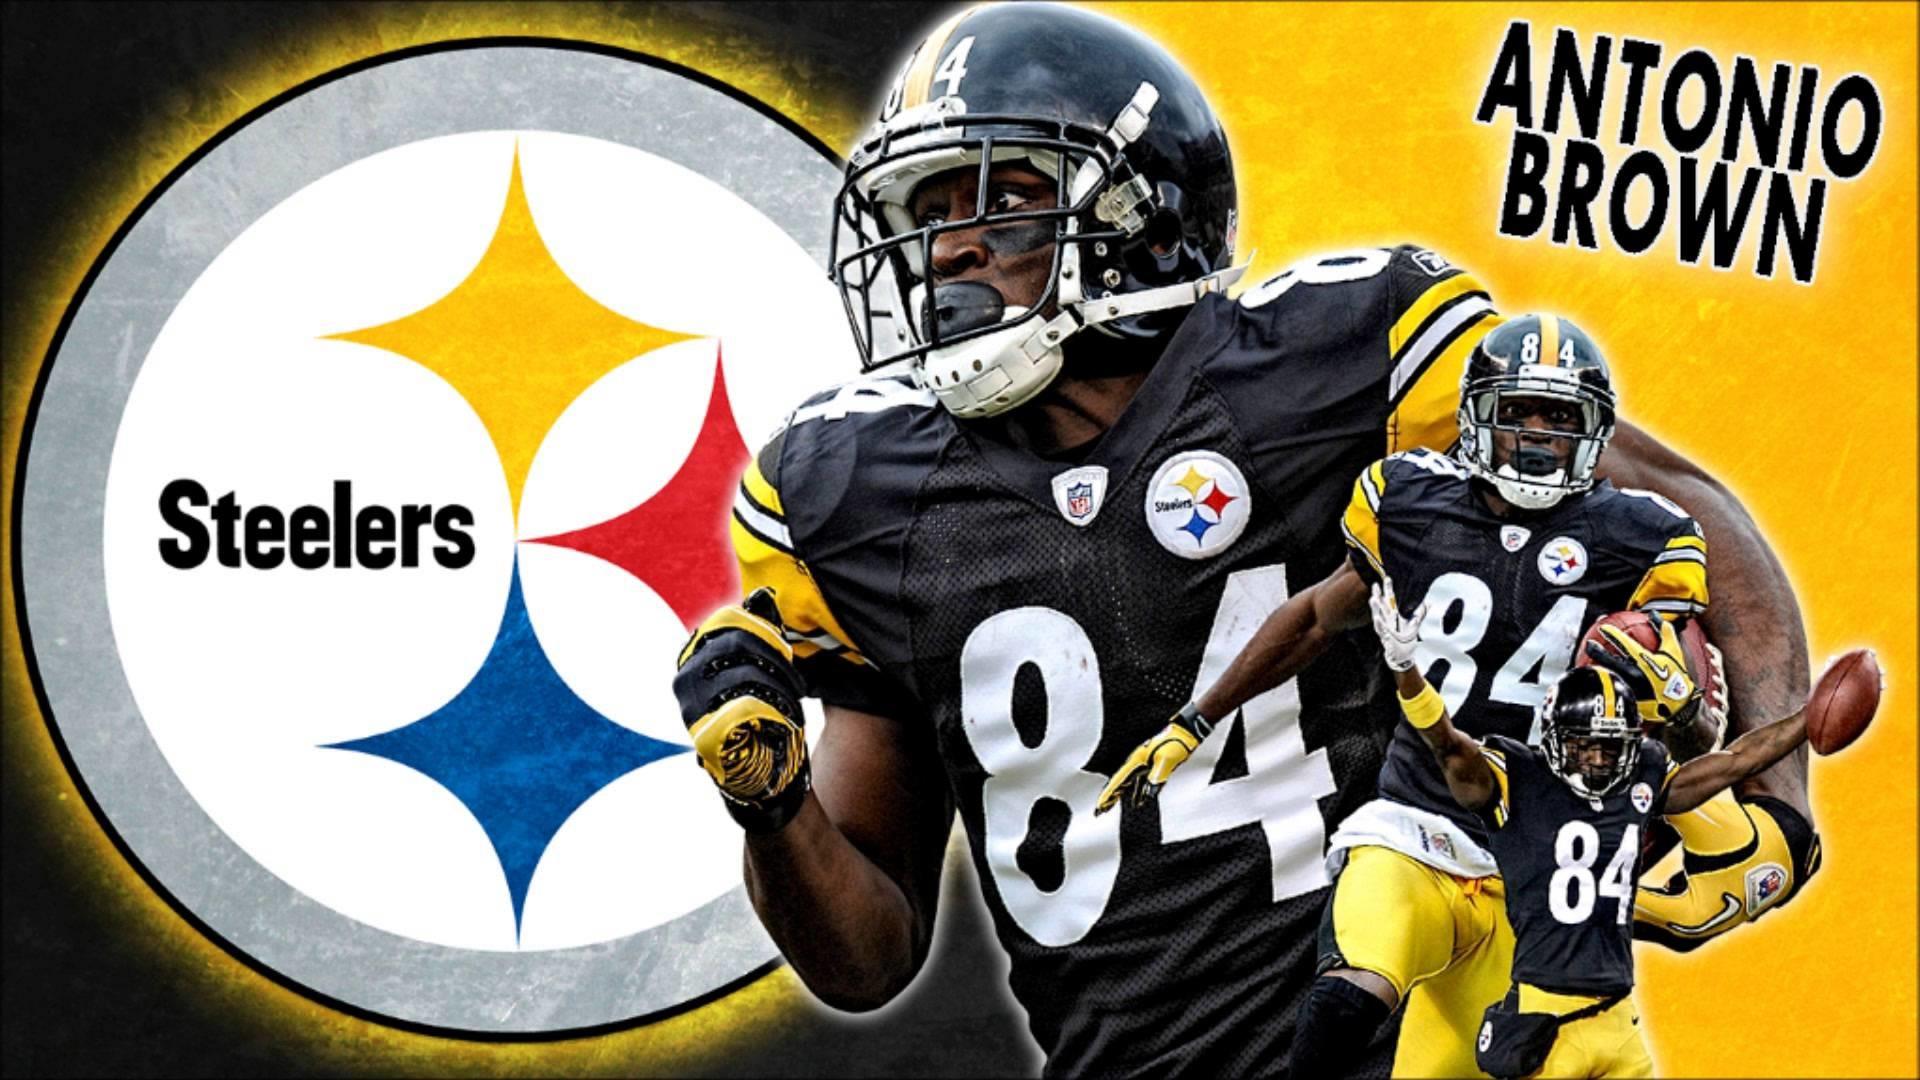 FREE NFL Antonio Brown Wallpaper